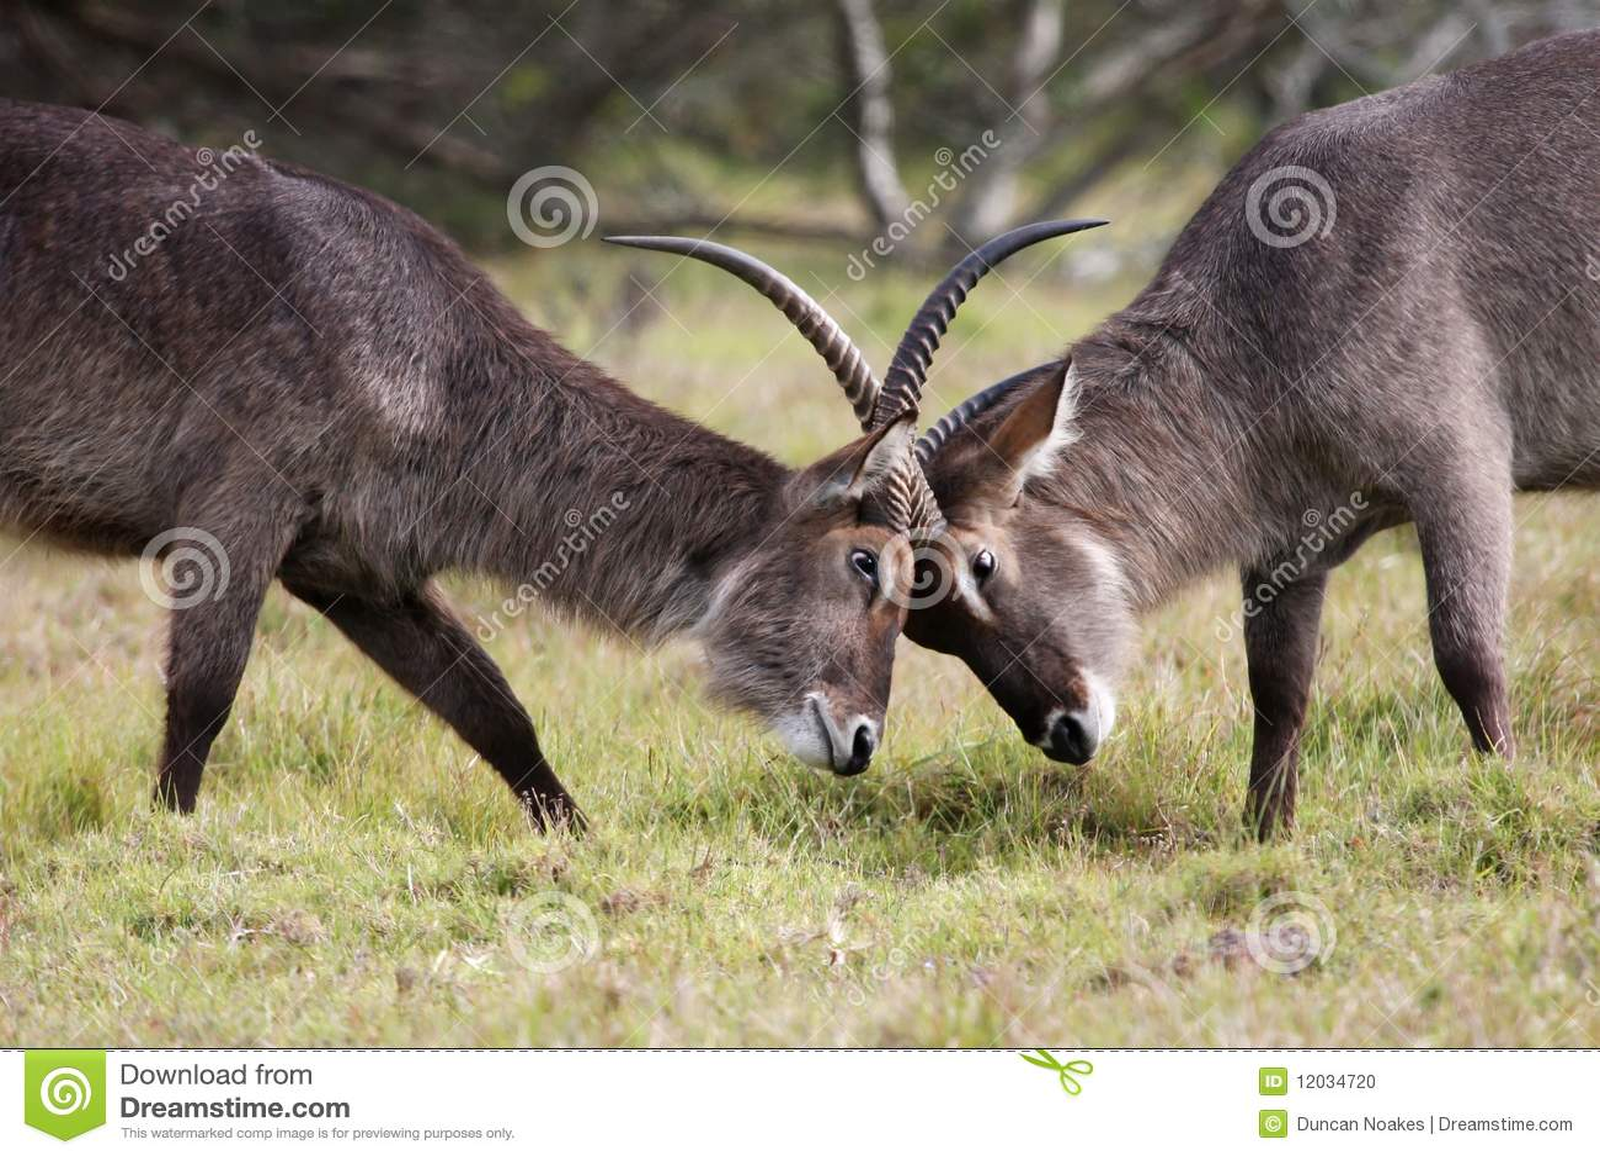 Waterbuck Antelope Fight